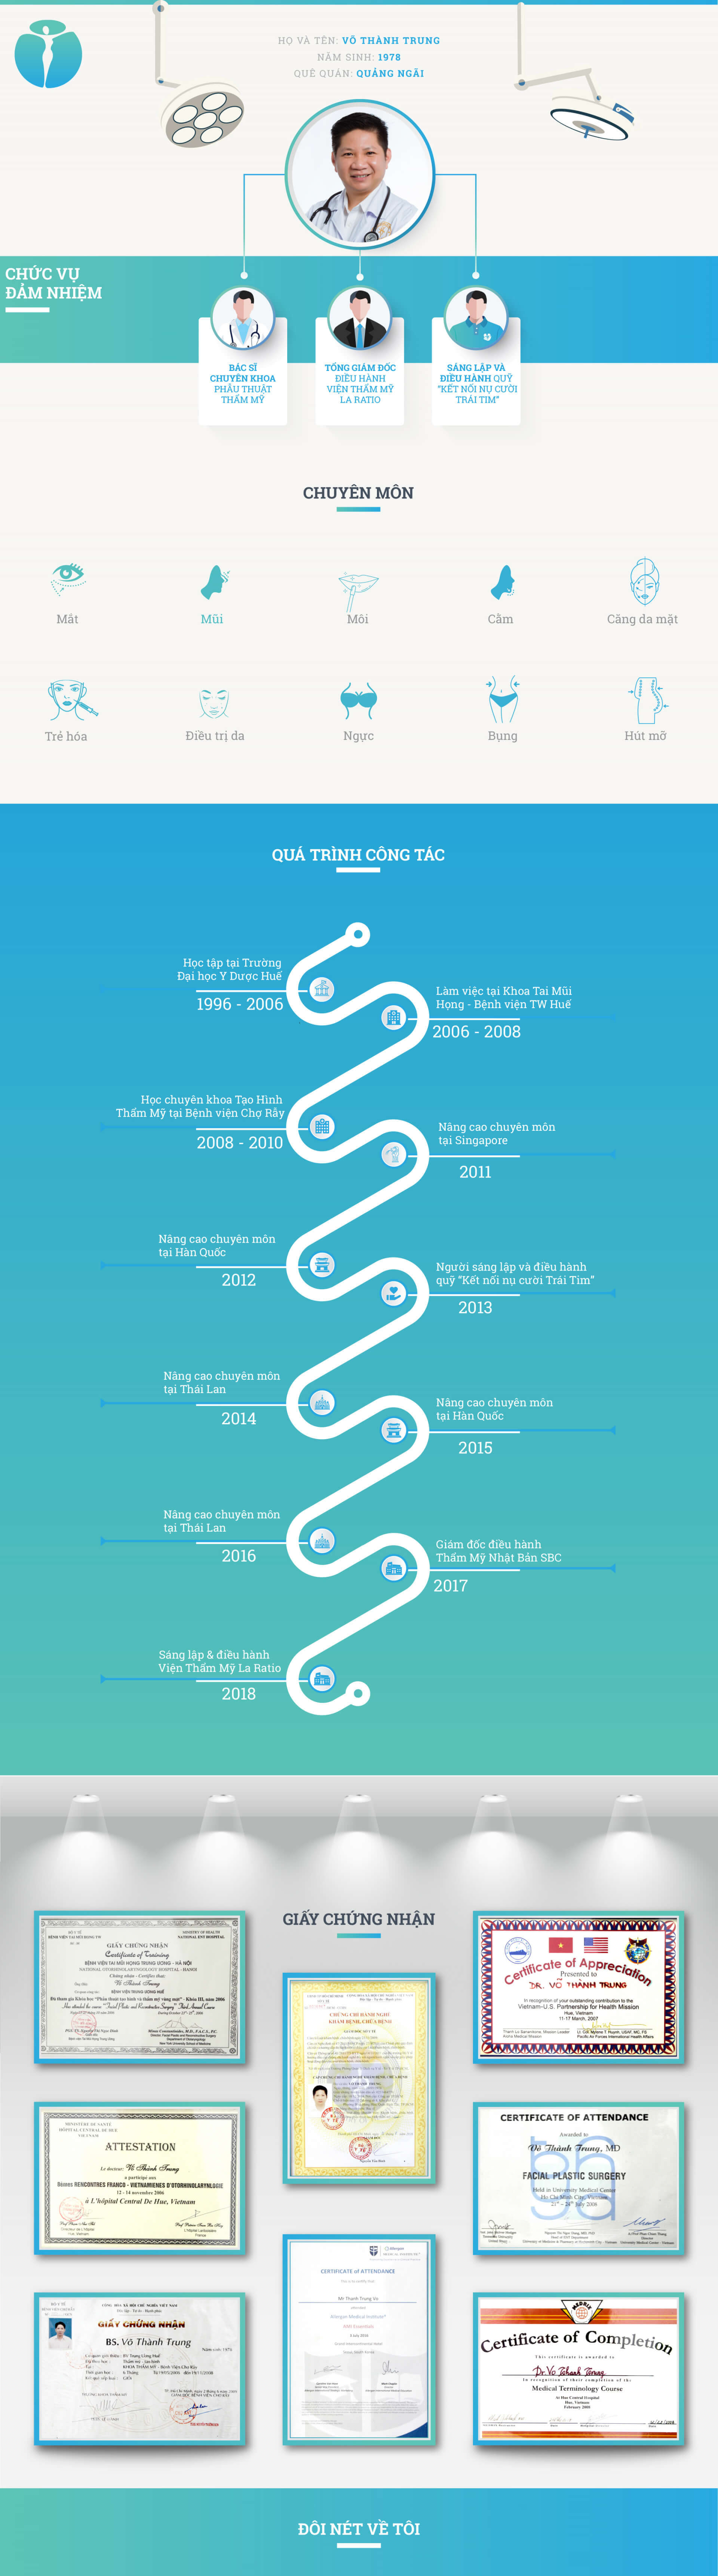 Infographic Vothanhtrung 2